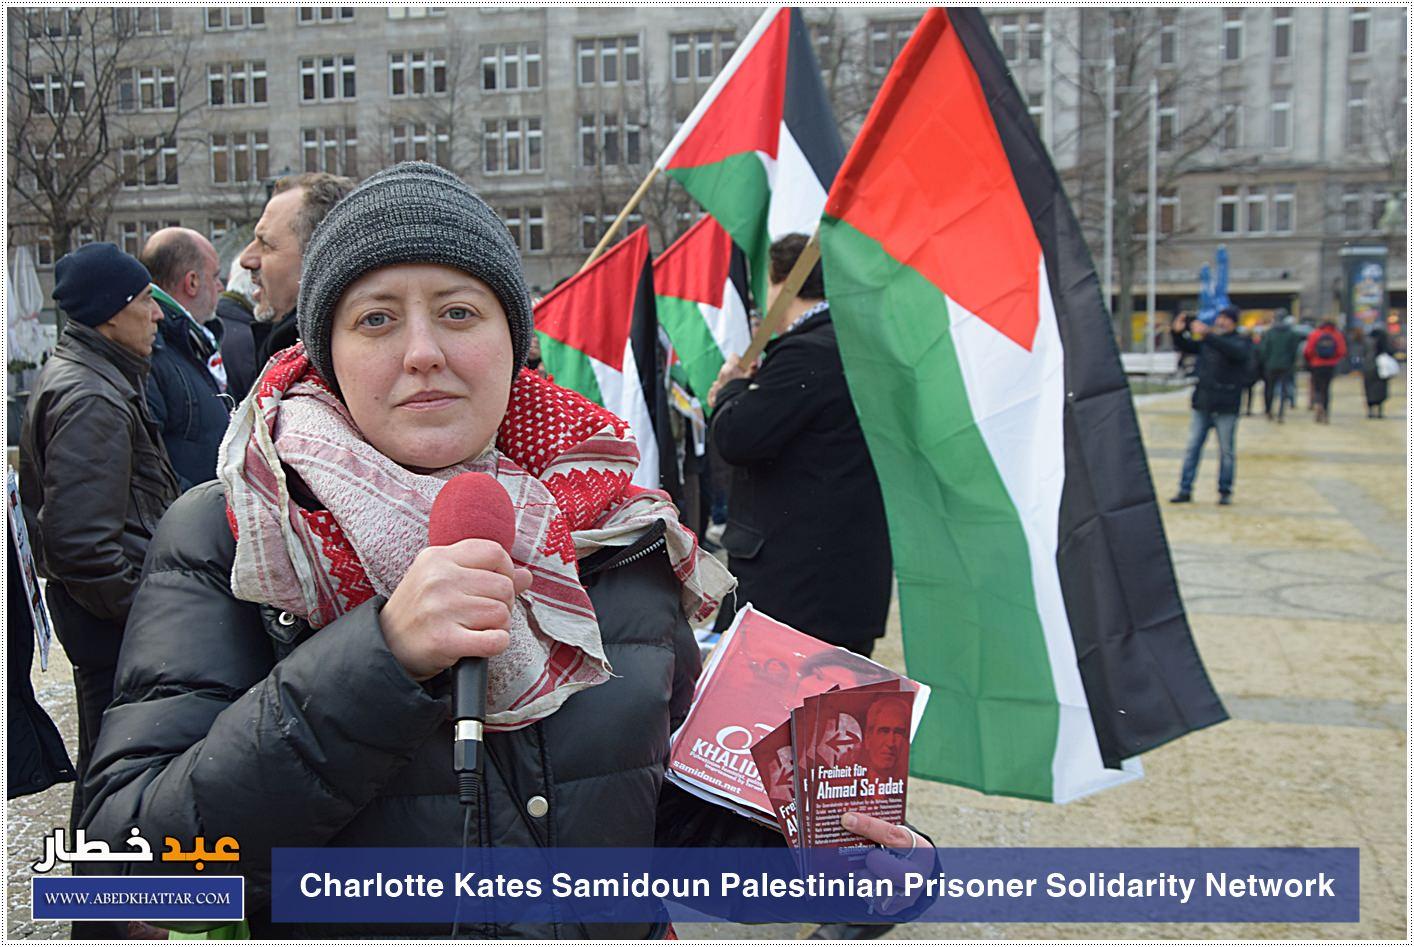 charlotte kates samidoun palestinian prisoner solidarity network